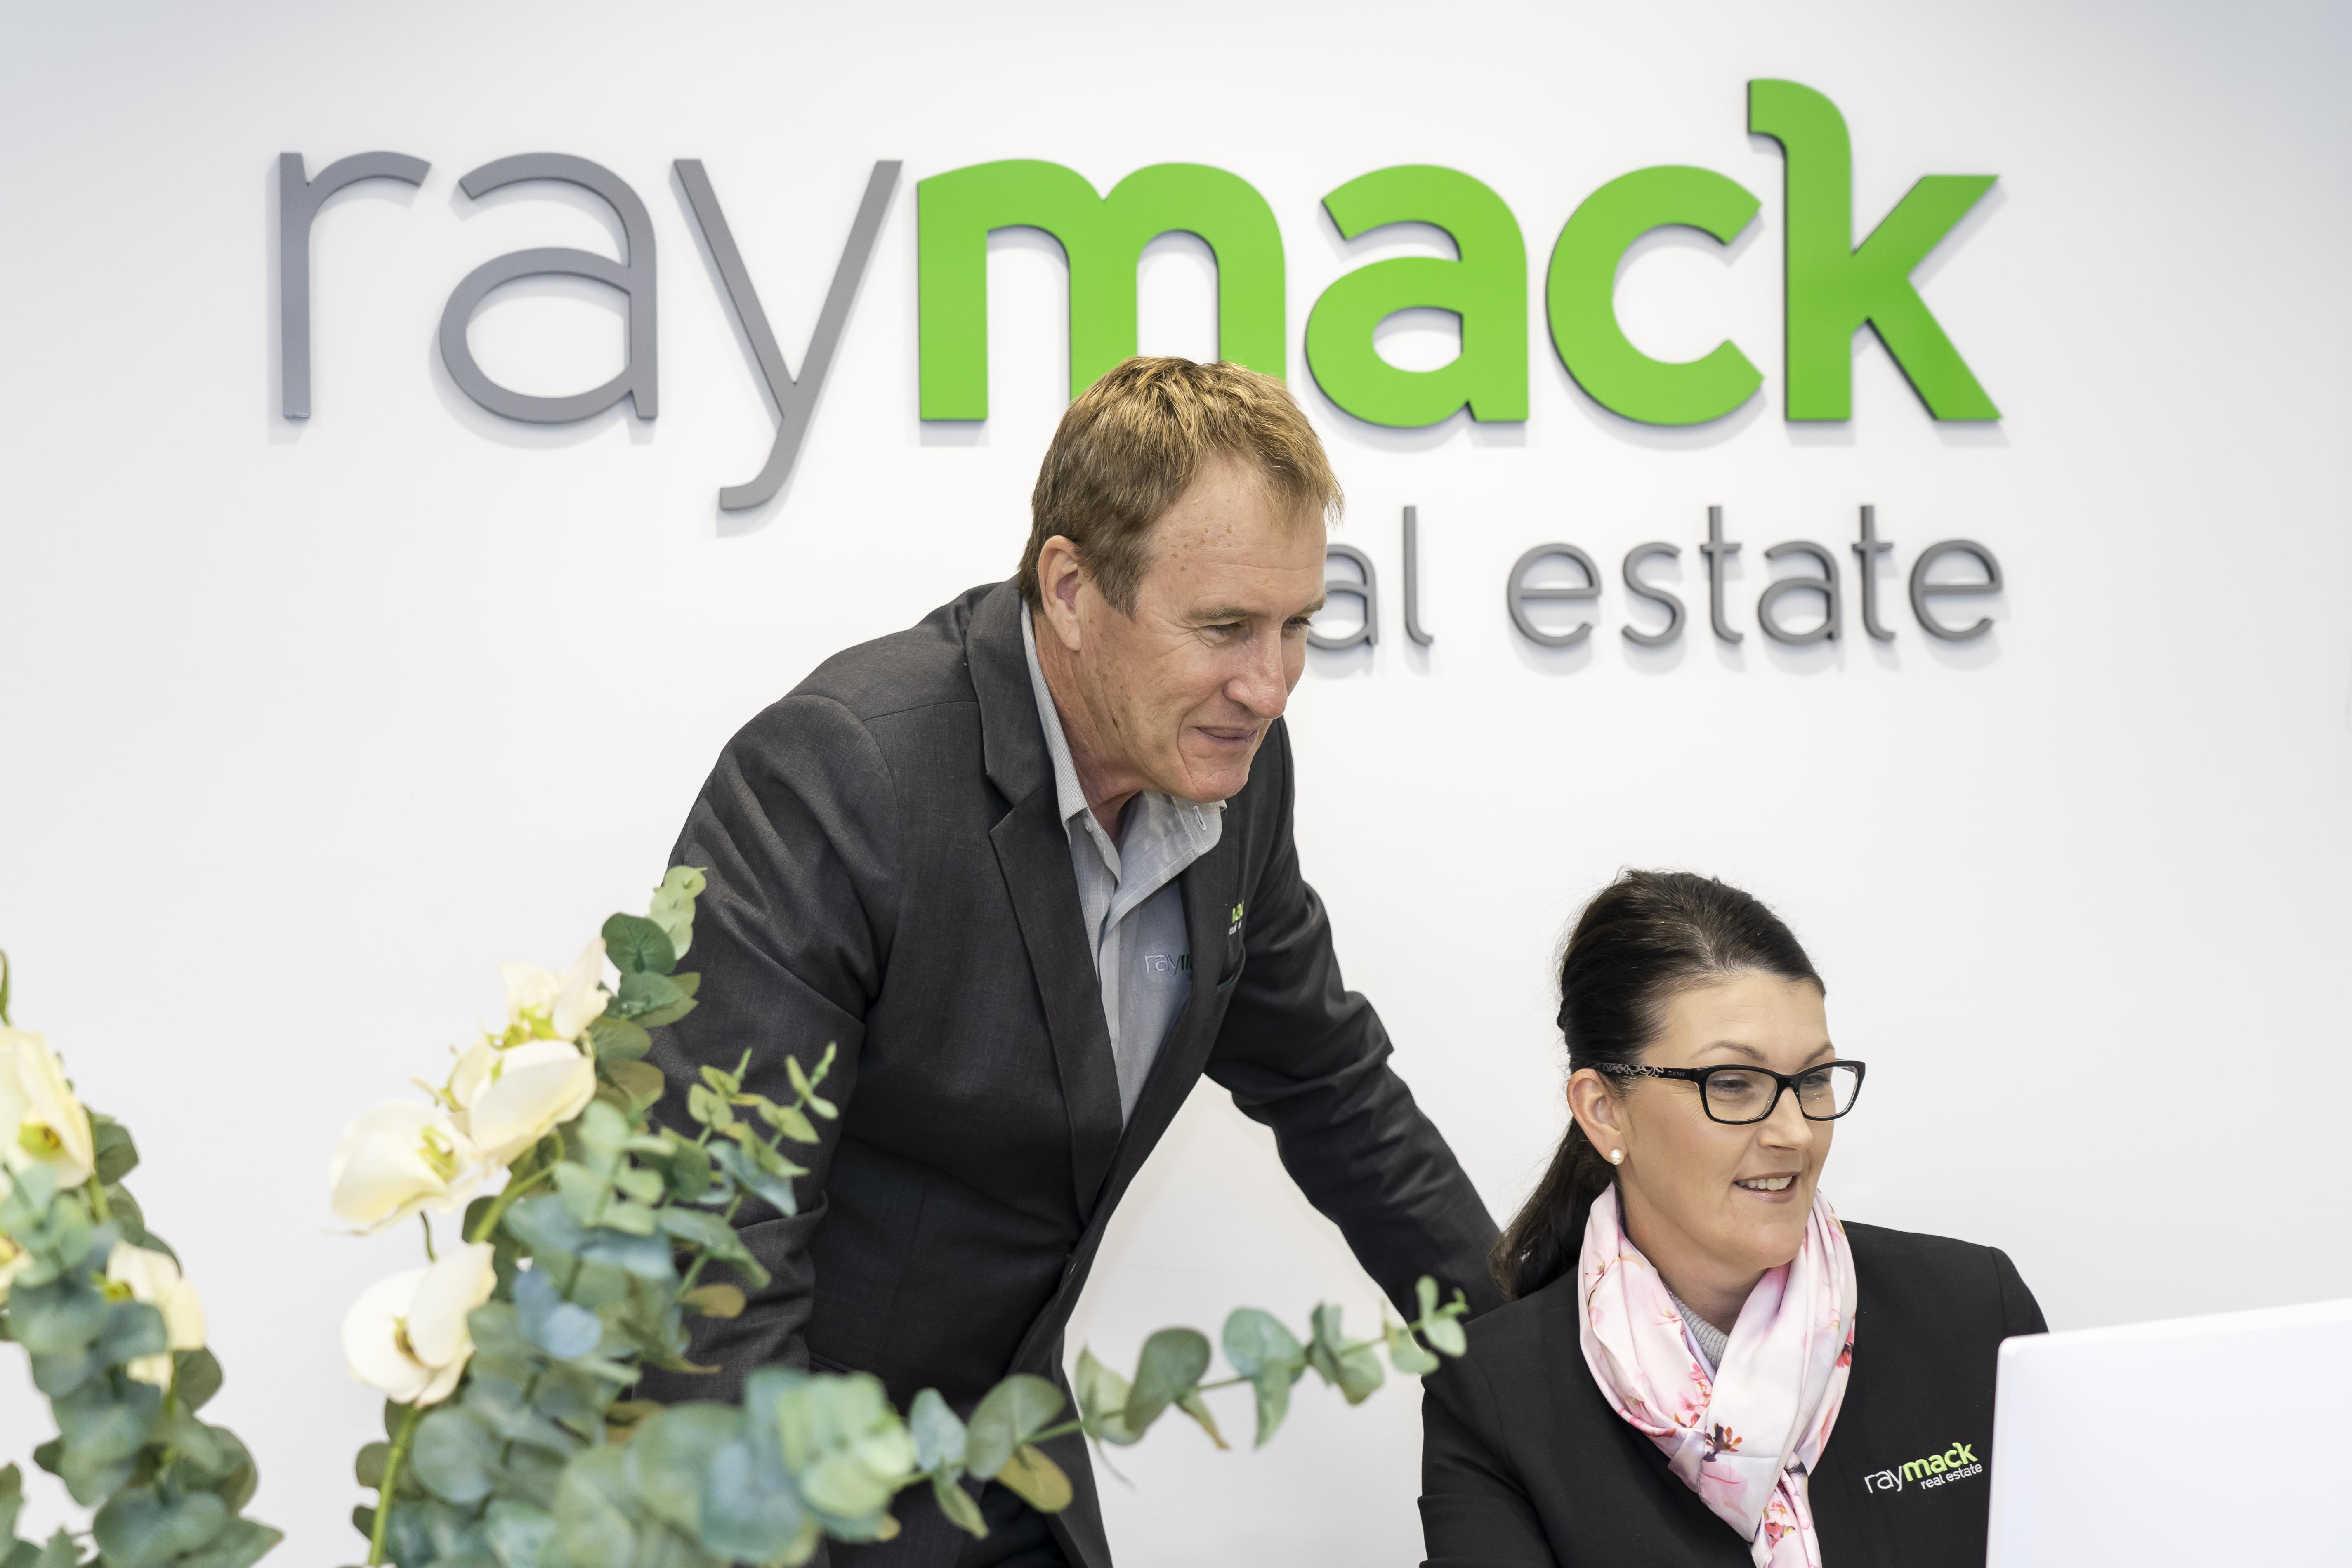 ray mack employees